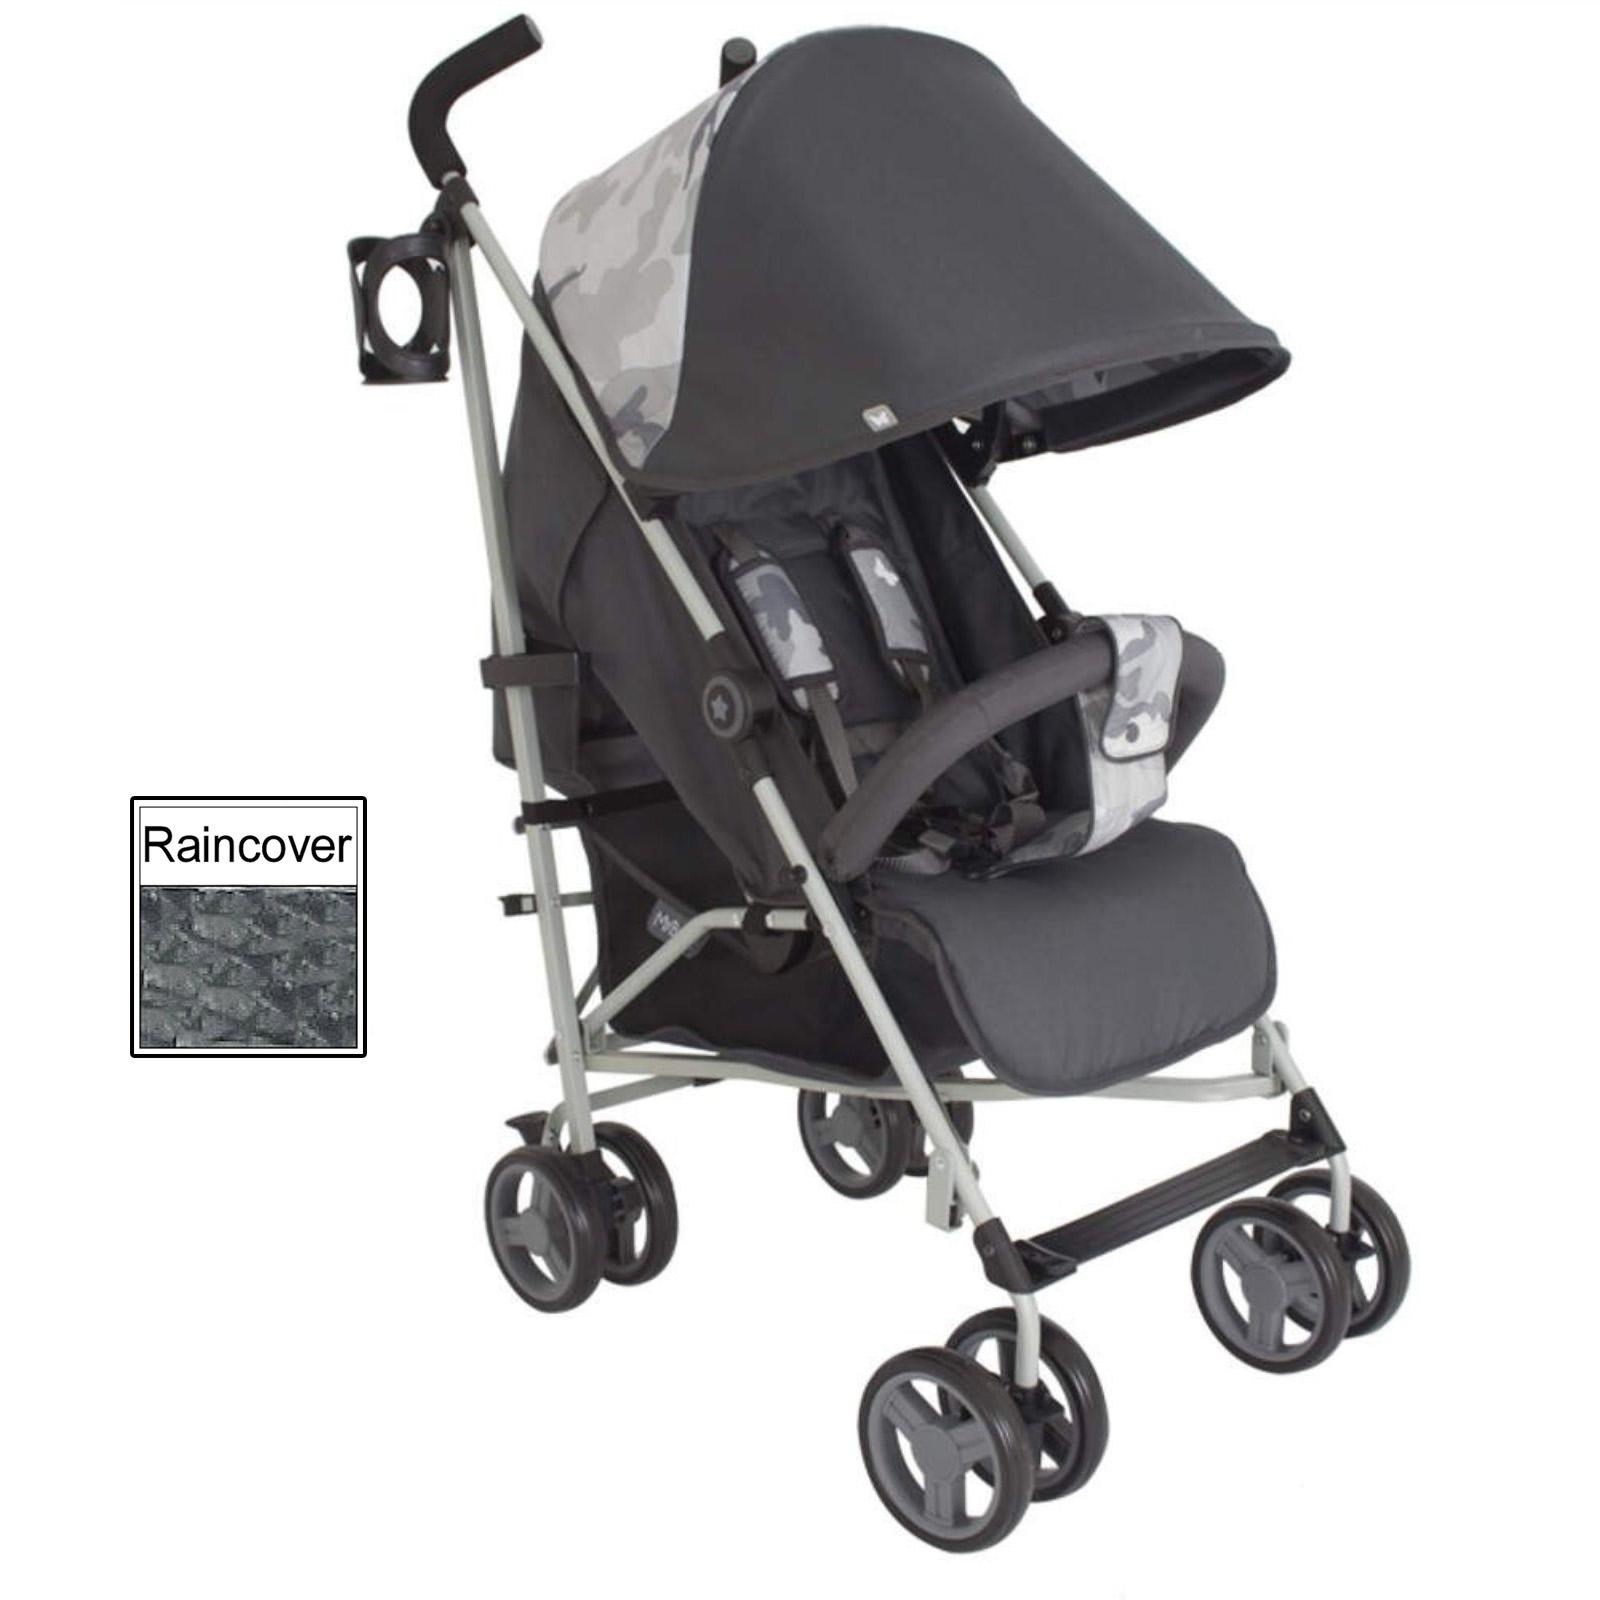 My Babiie MB02 Stroller *Katie Piper Believe Collection* - Grey Camo £59.99 Online4baby